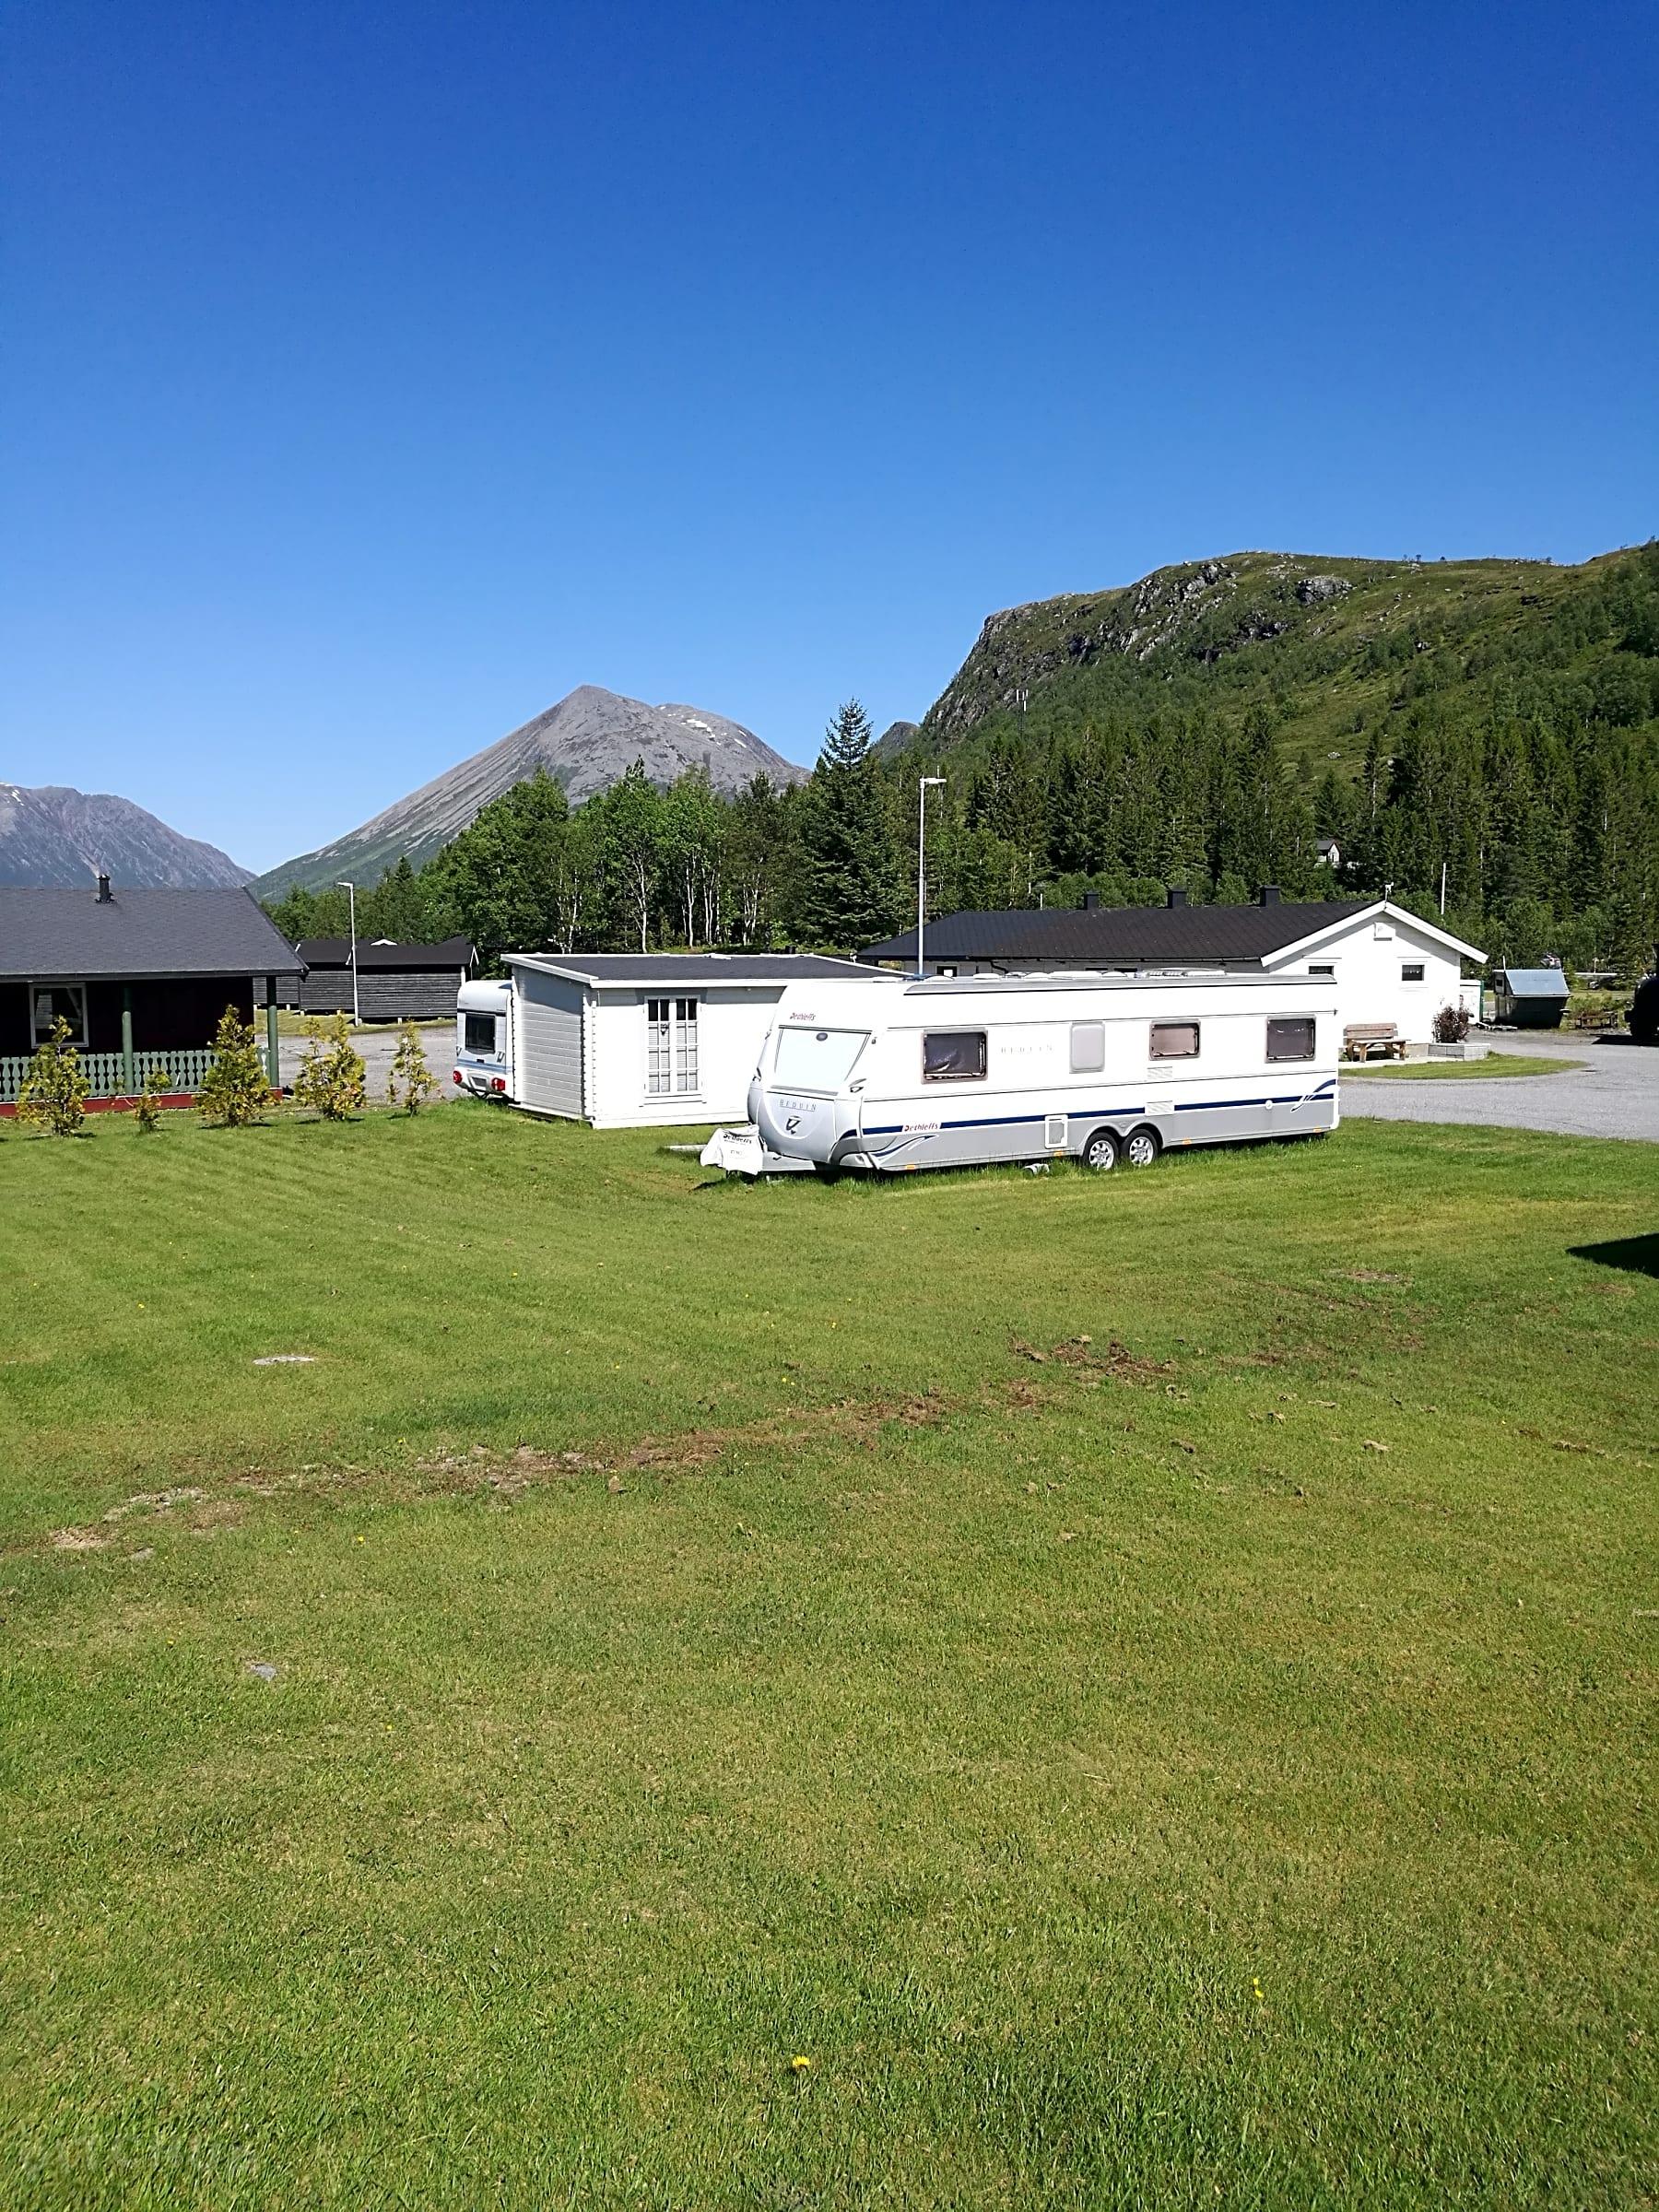 Finn billige teltplasser i Norge Pitchup®